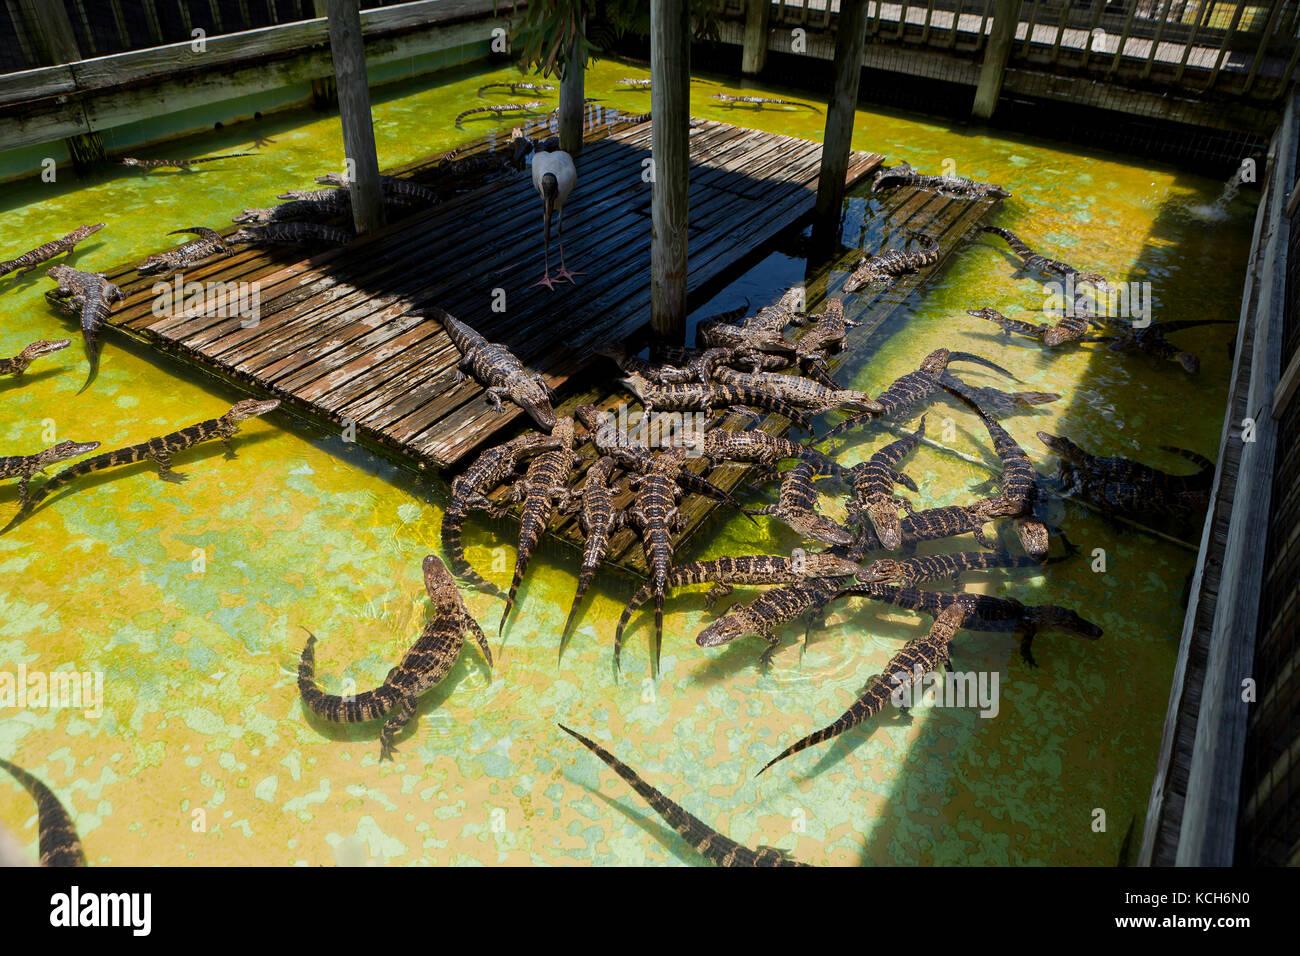 Juvenile American alligators (Alligator mississippiensis) basking in sun at Gatorland - Orlando, Florida USA - Stock Image